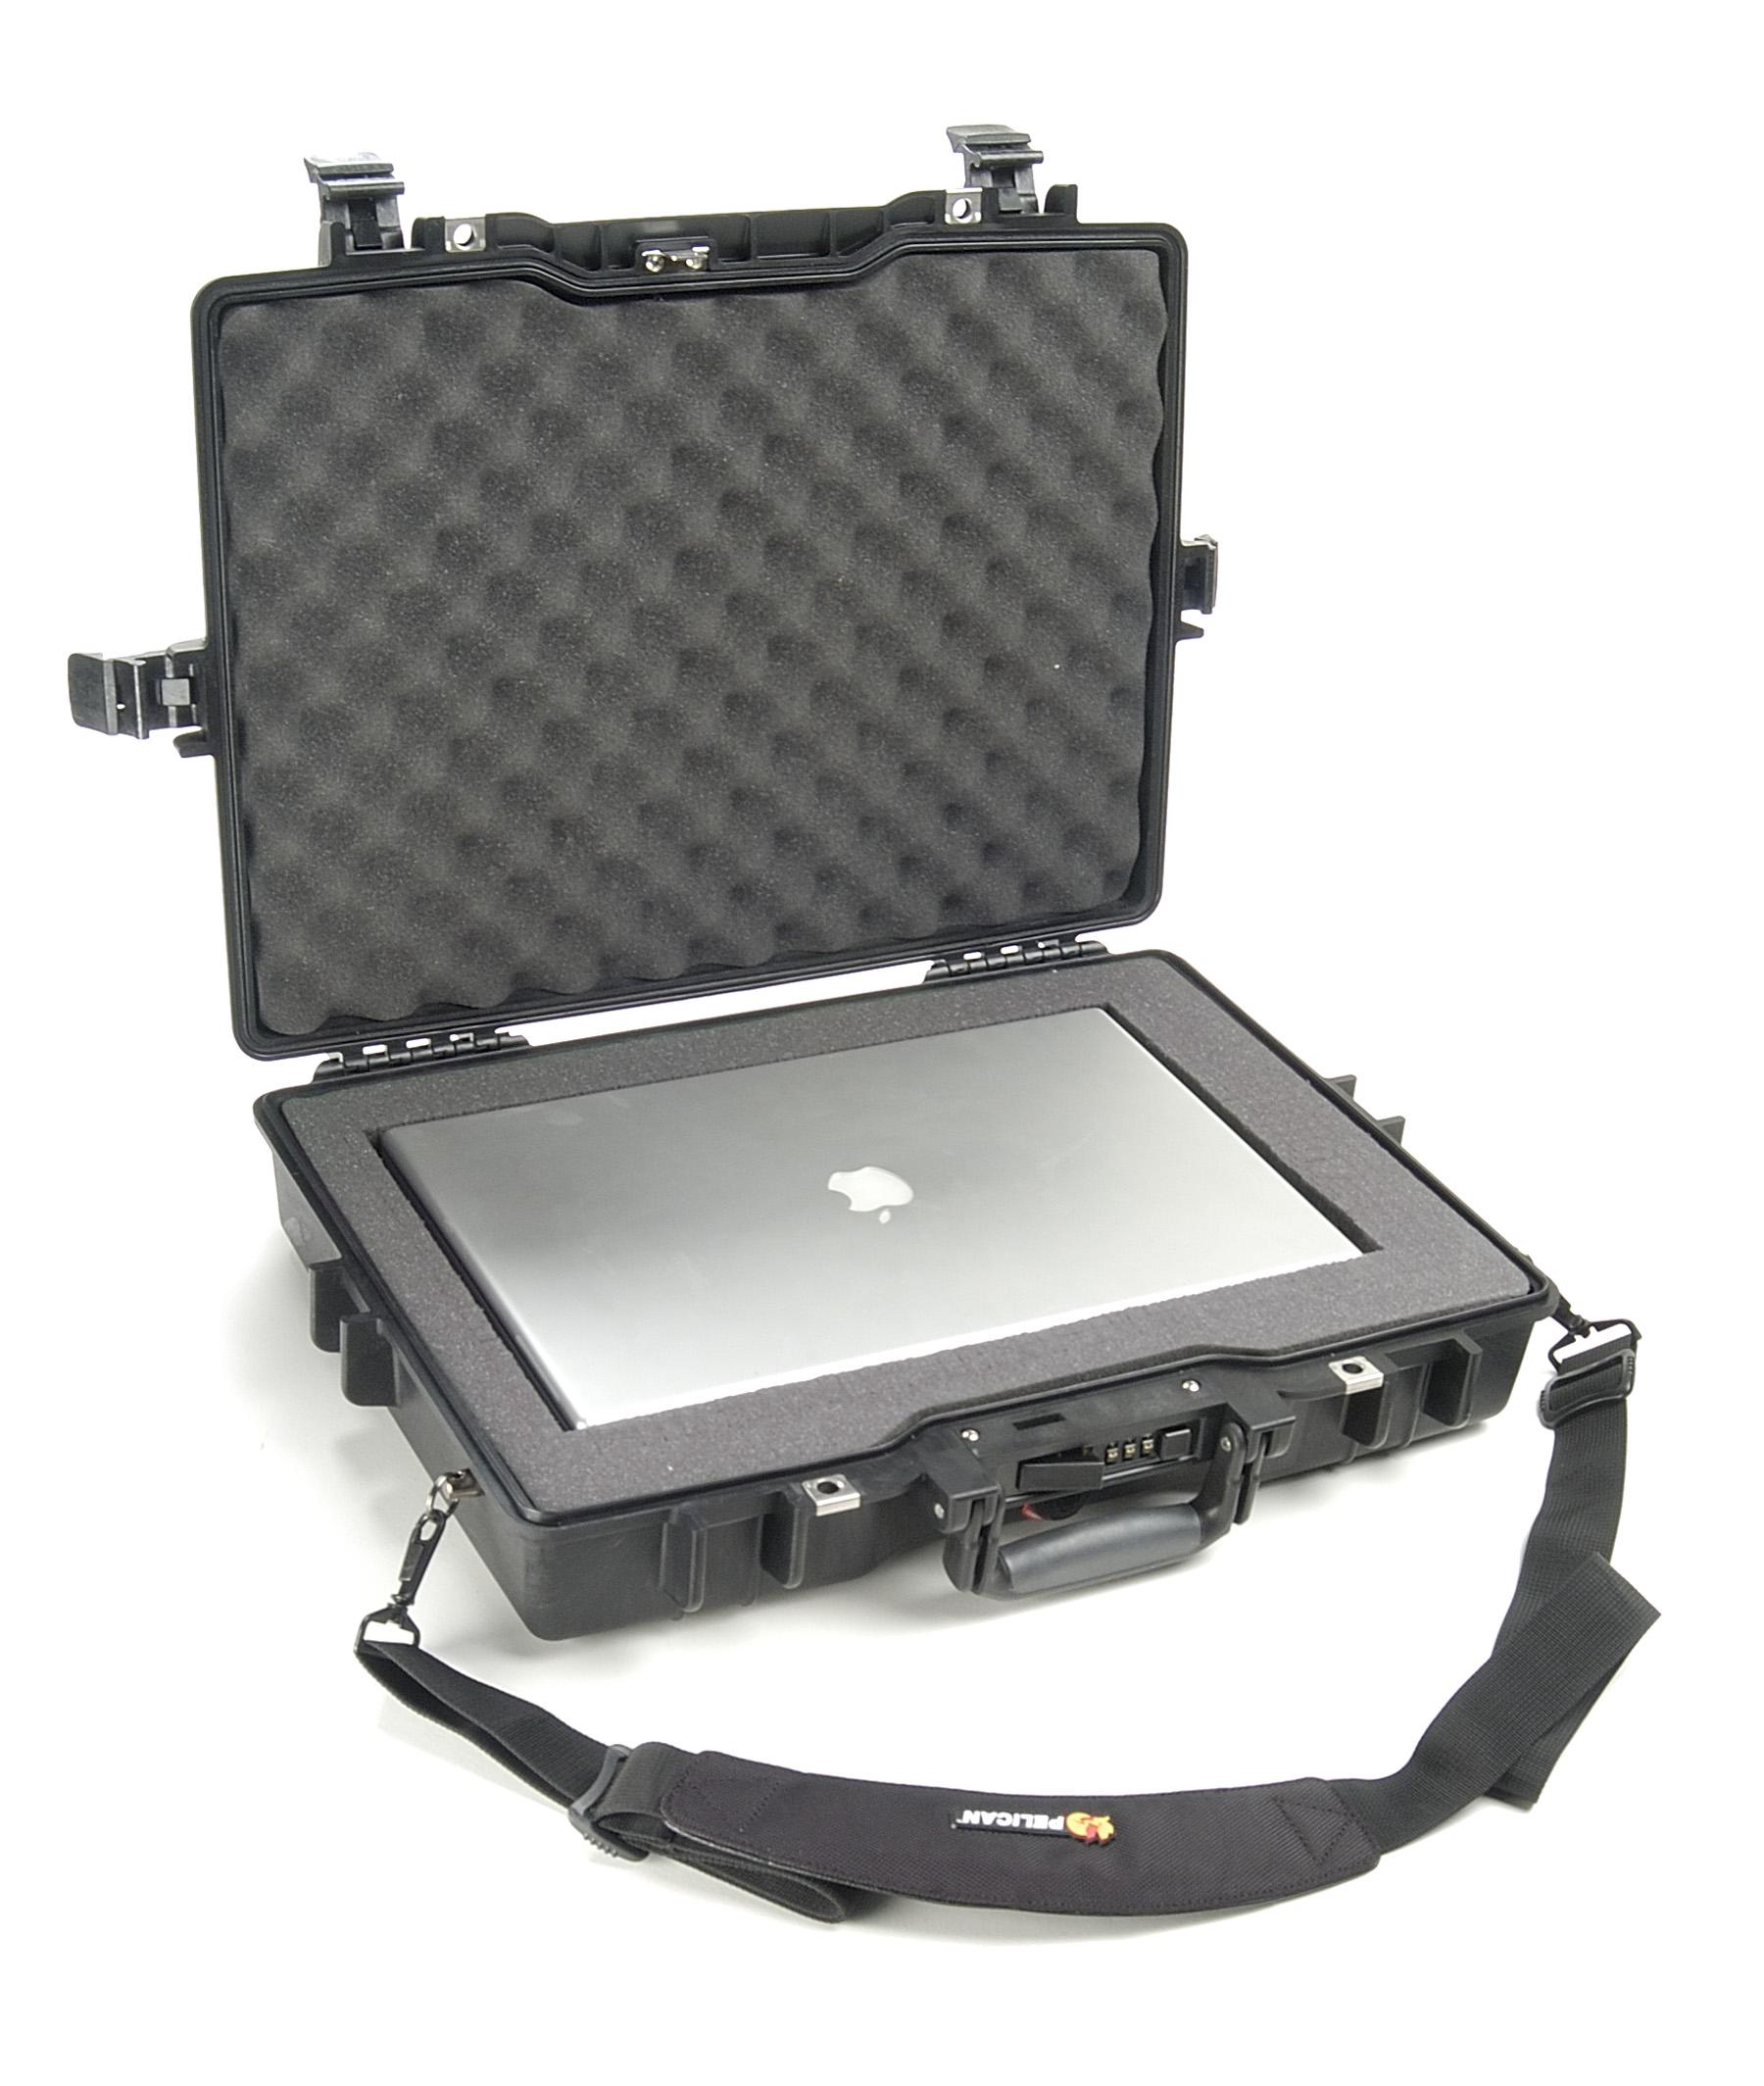 1495 - Pelican 1495 Computer Case